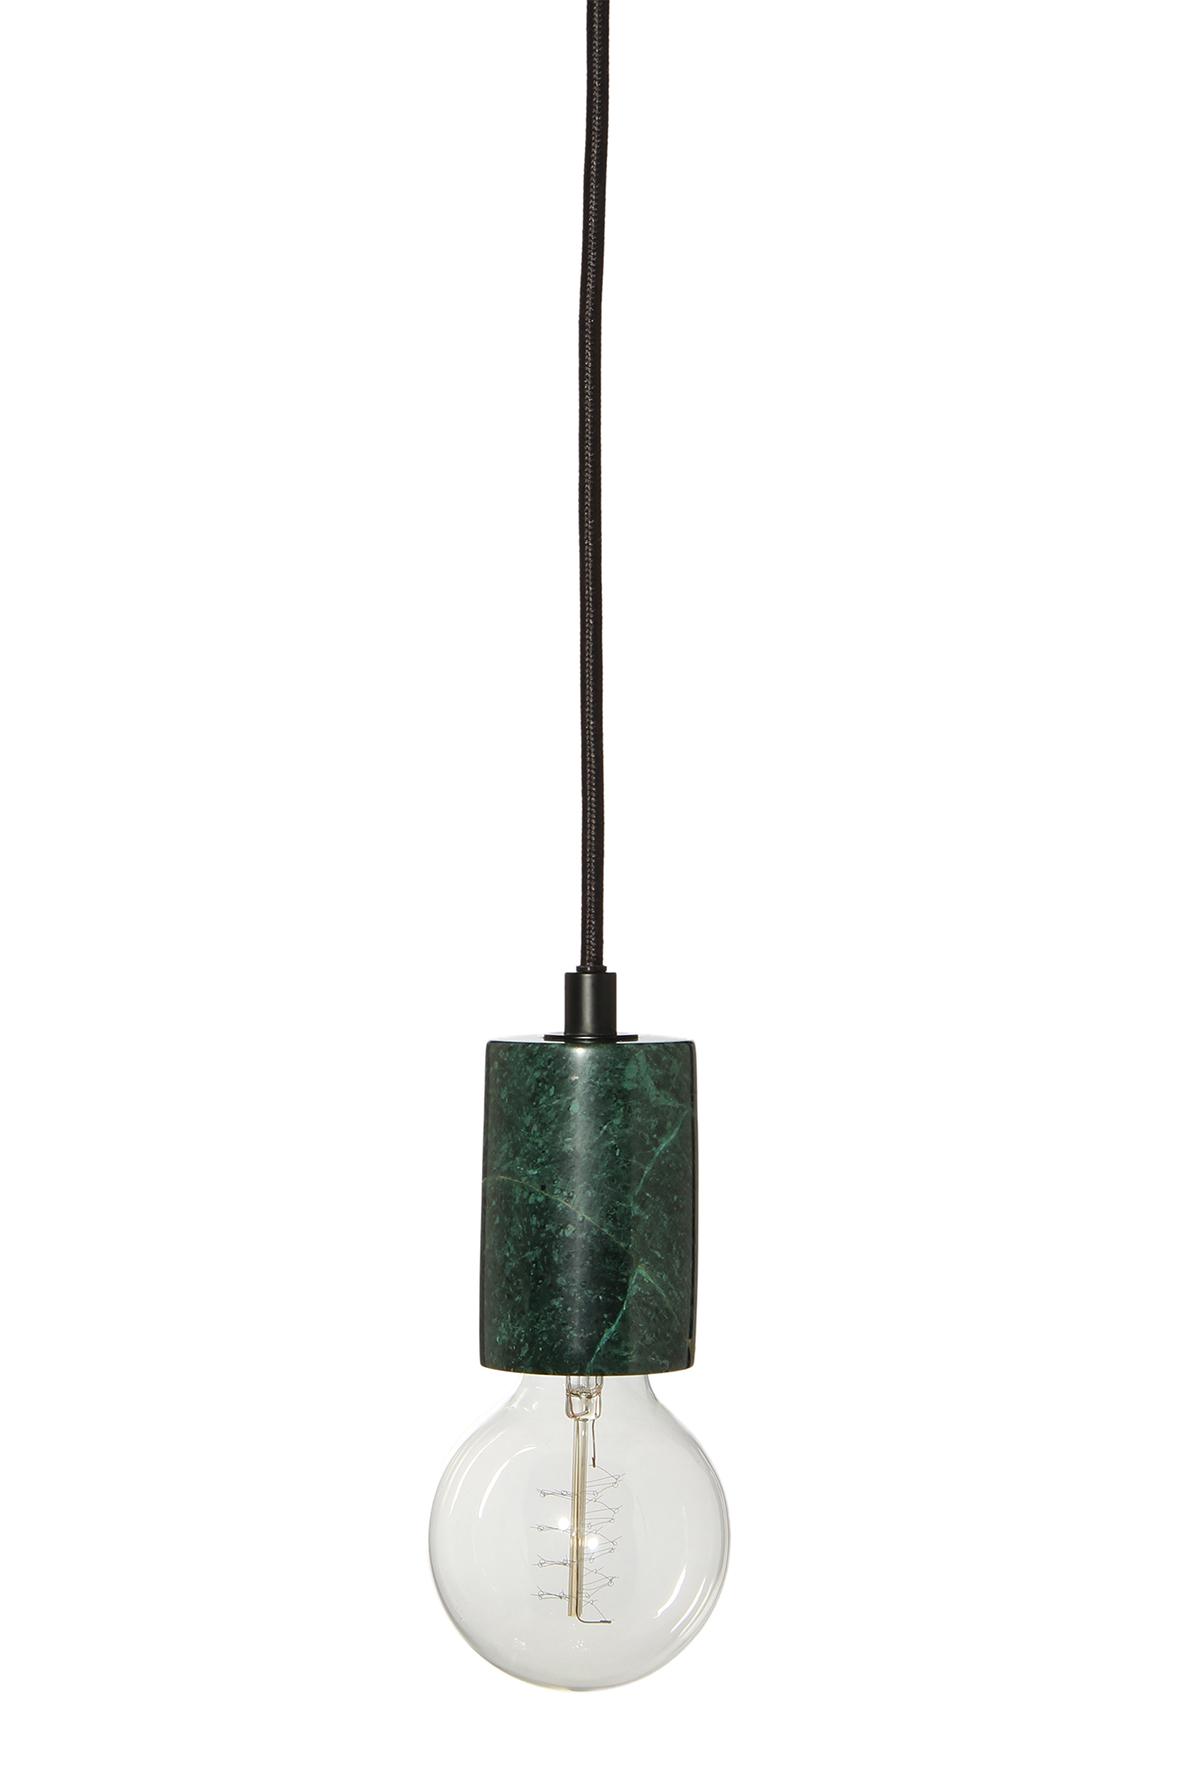 Lustra Bristol Green Marble